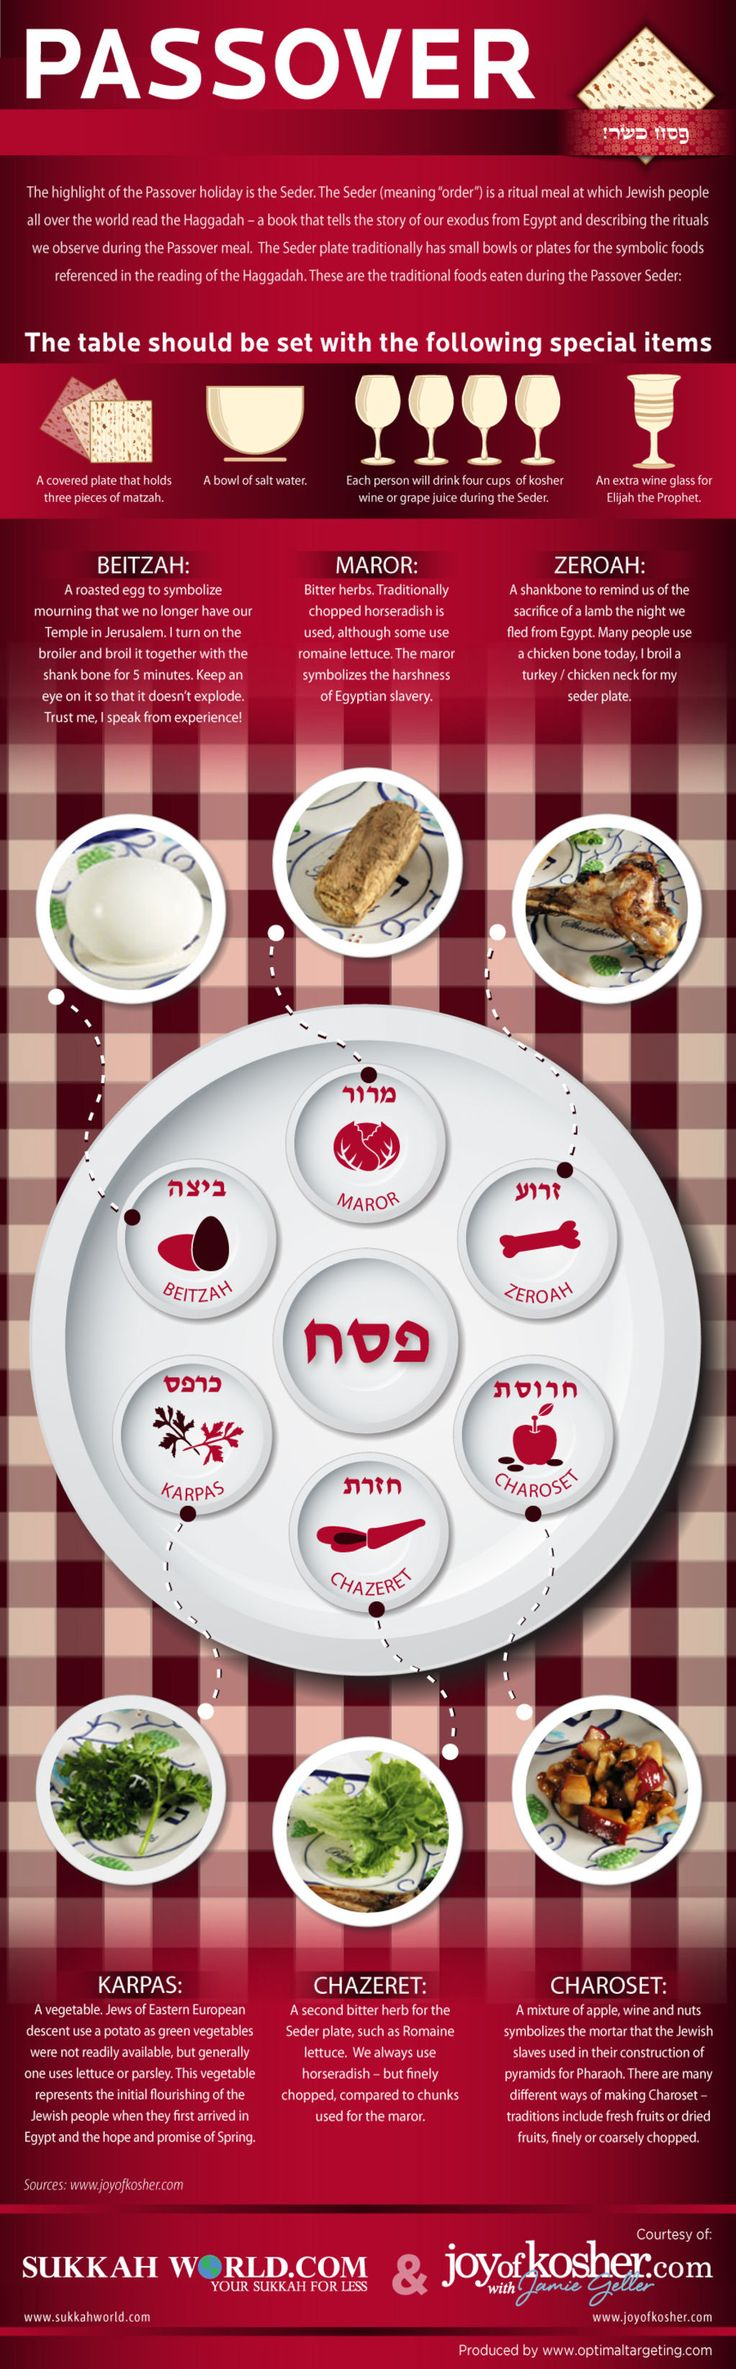 Passover Seder Plate Infographic | Joy of Kosher